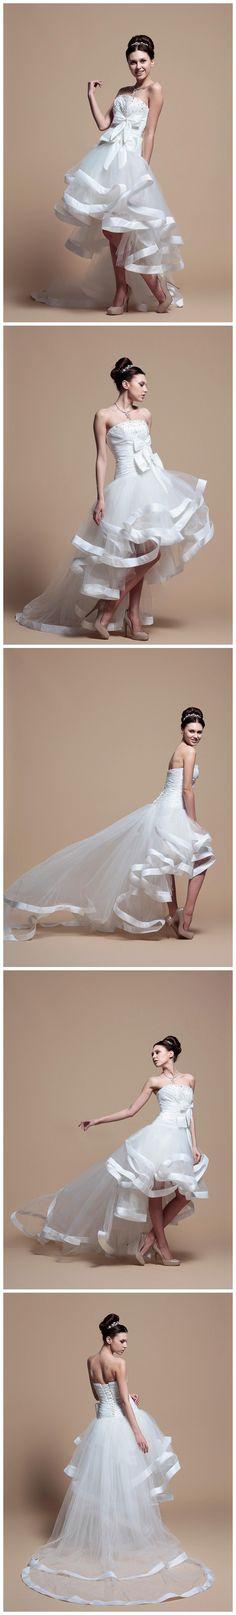 wedding dressses, gold weddings, short wedding dresses, wedding ideas, crazy dresses, dream wedding dresses, reception dresses, bride groom, short dresses